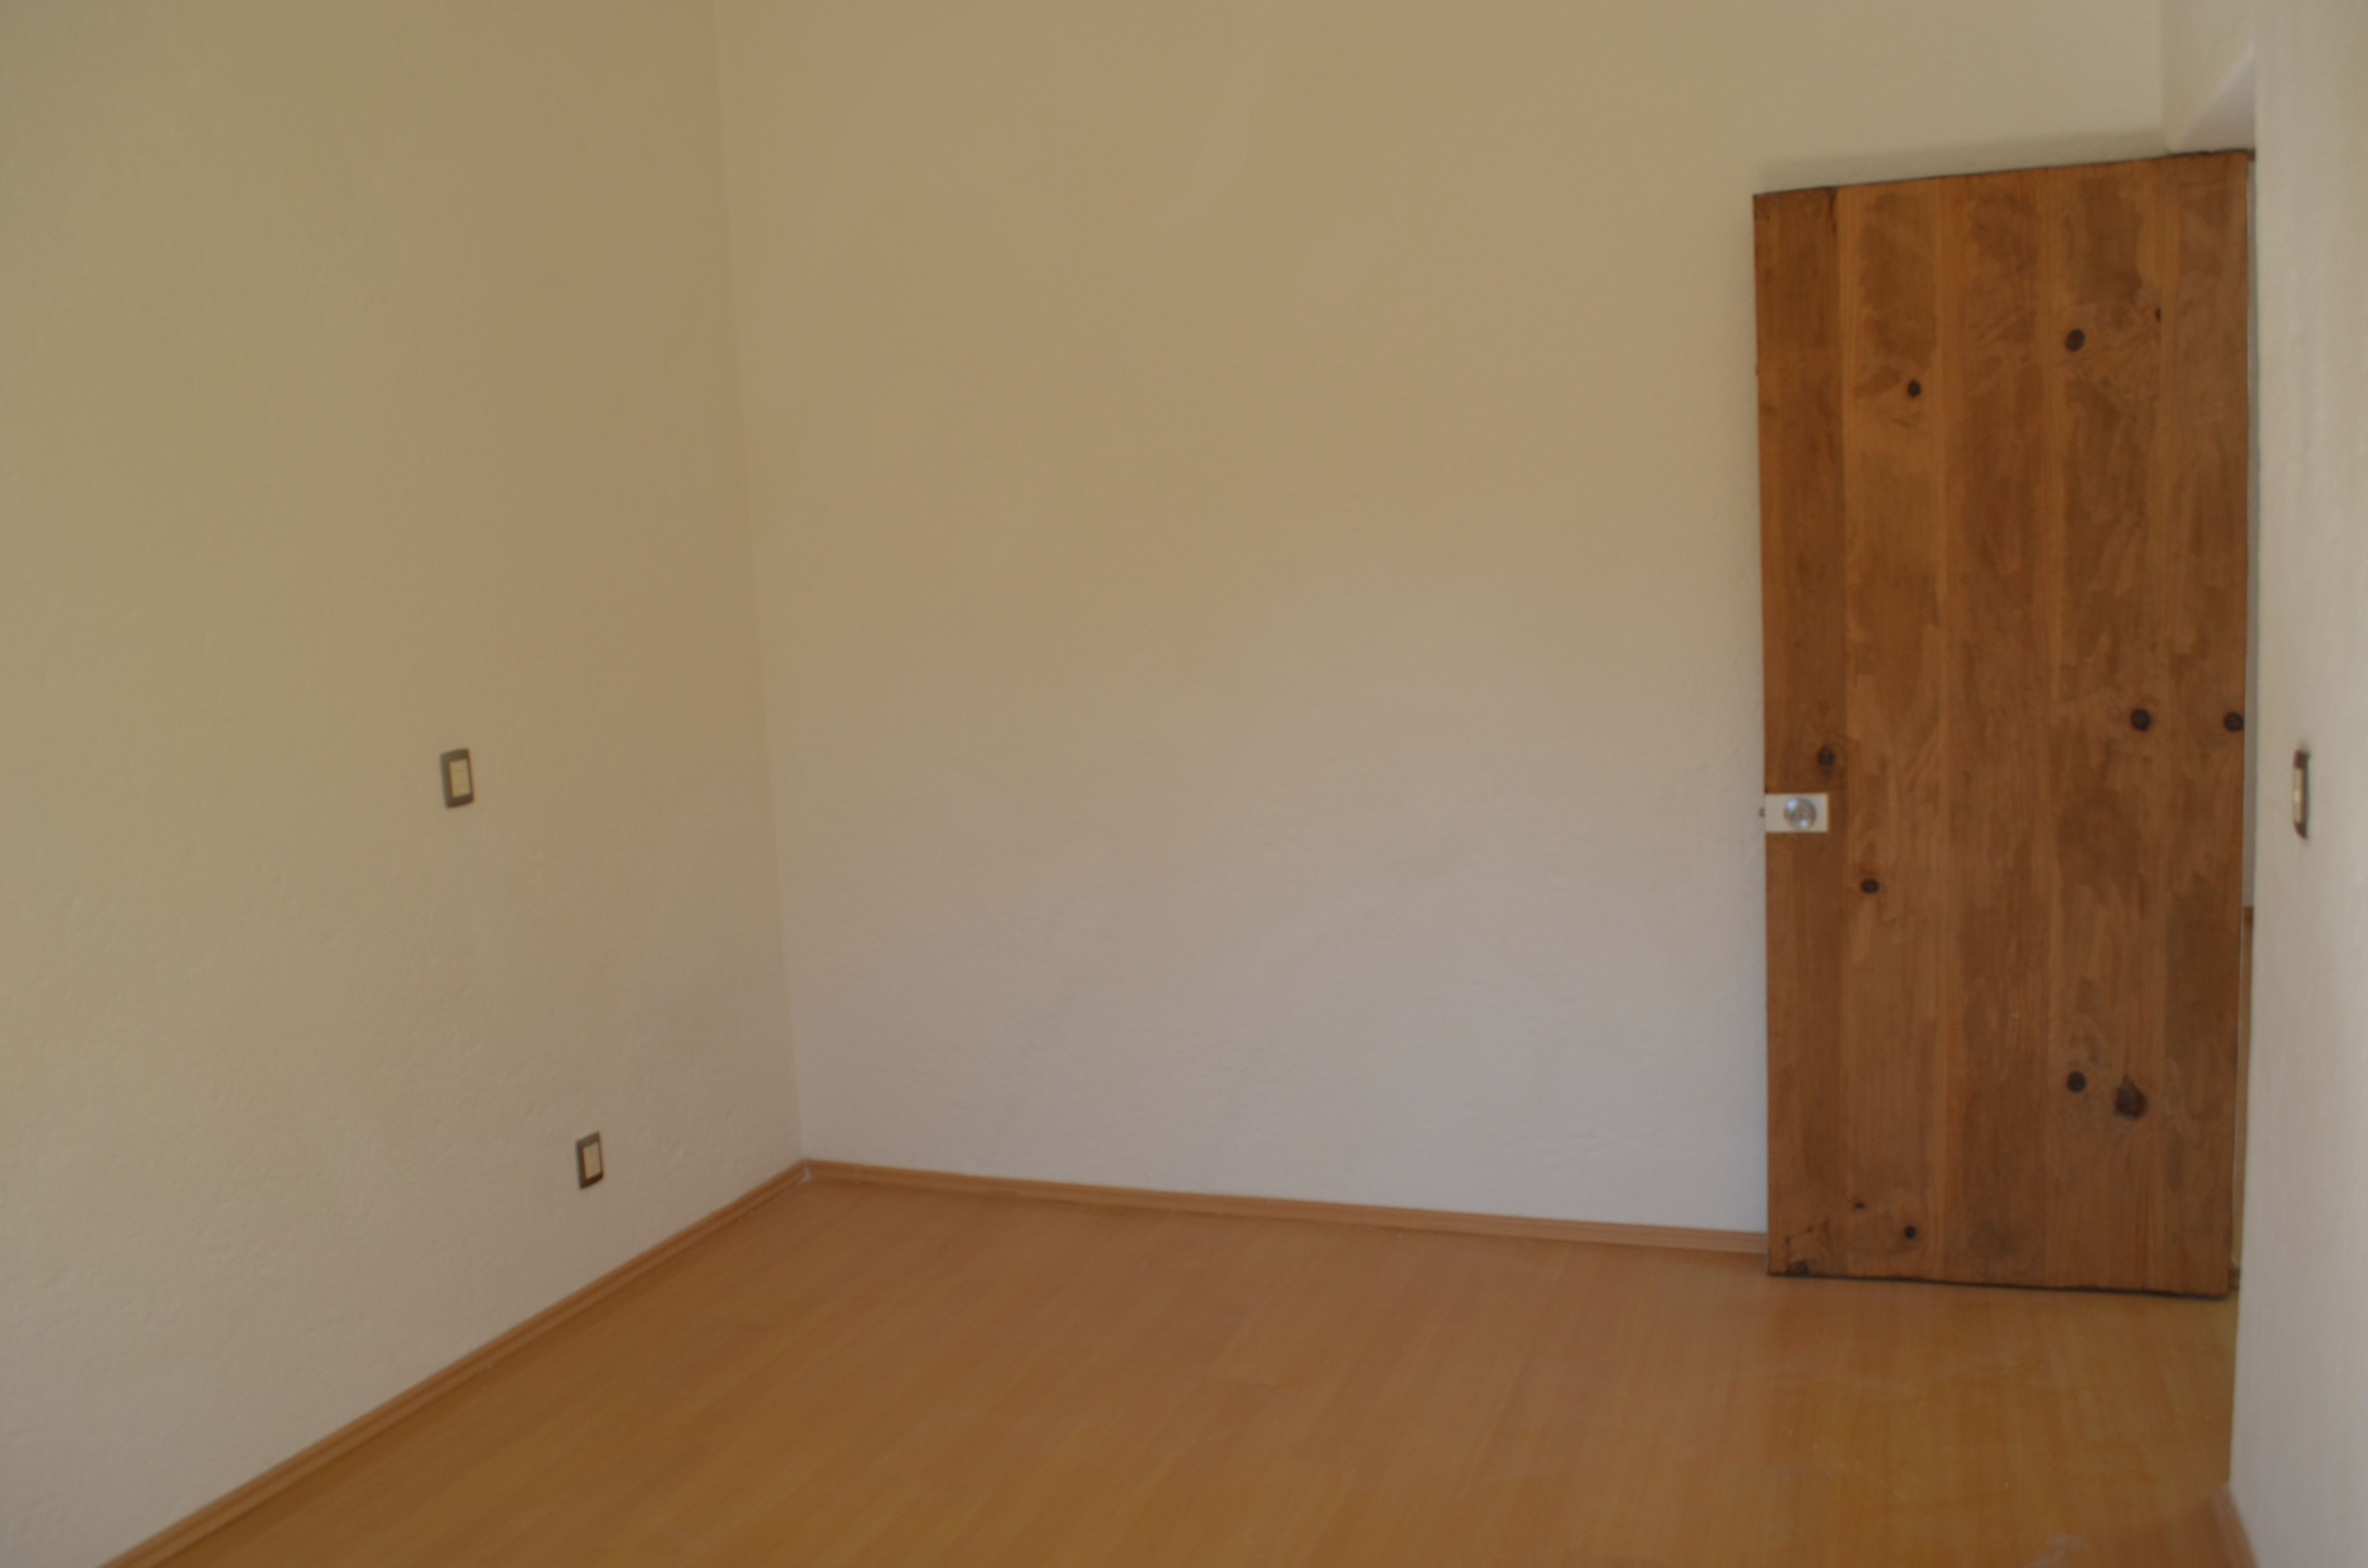 Alamillos 58, casa en venta,Toluca, Estado de México